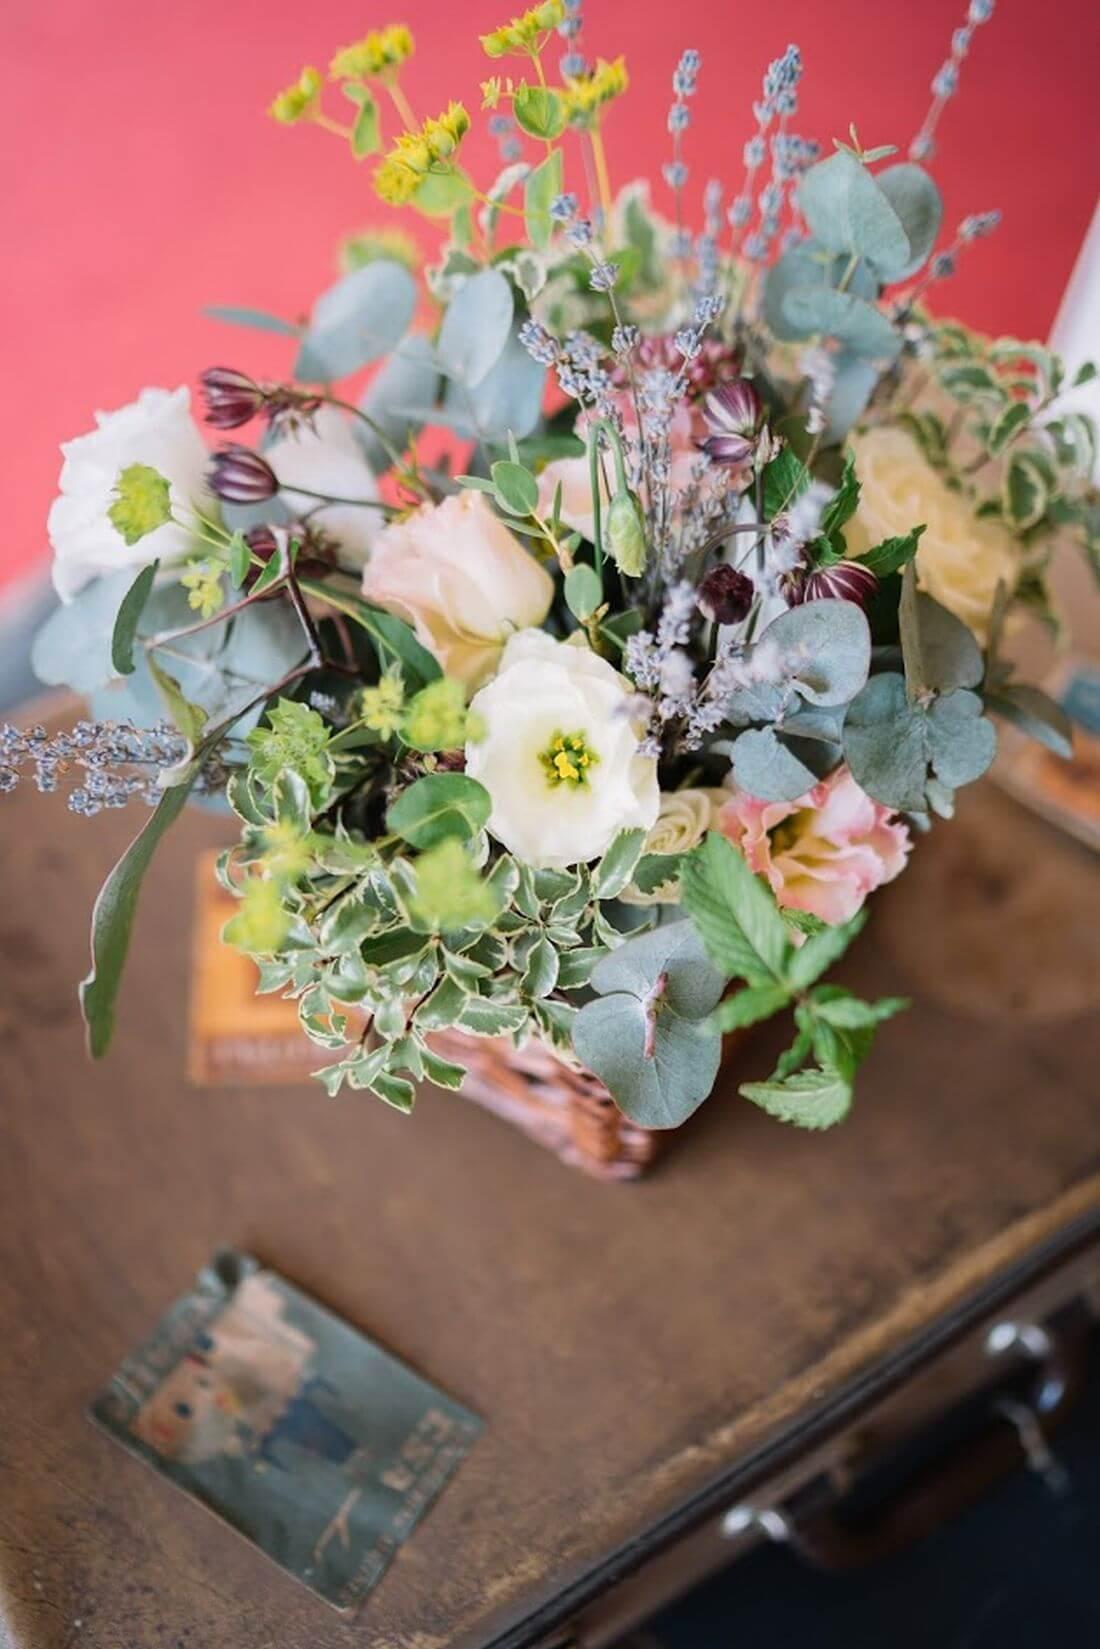 Nunta cu artificii, lavanda si muzica – Adelina si Ionut-IDO-Weddings-nuntiinaerliber (21)